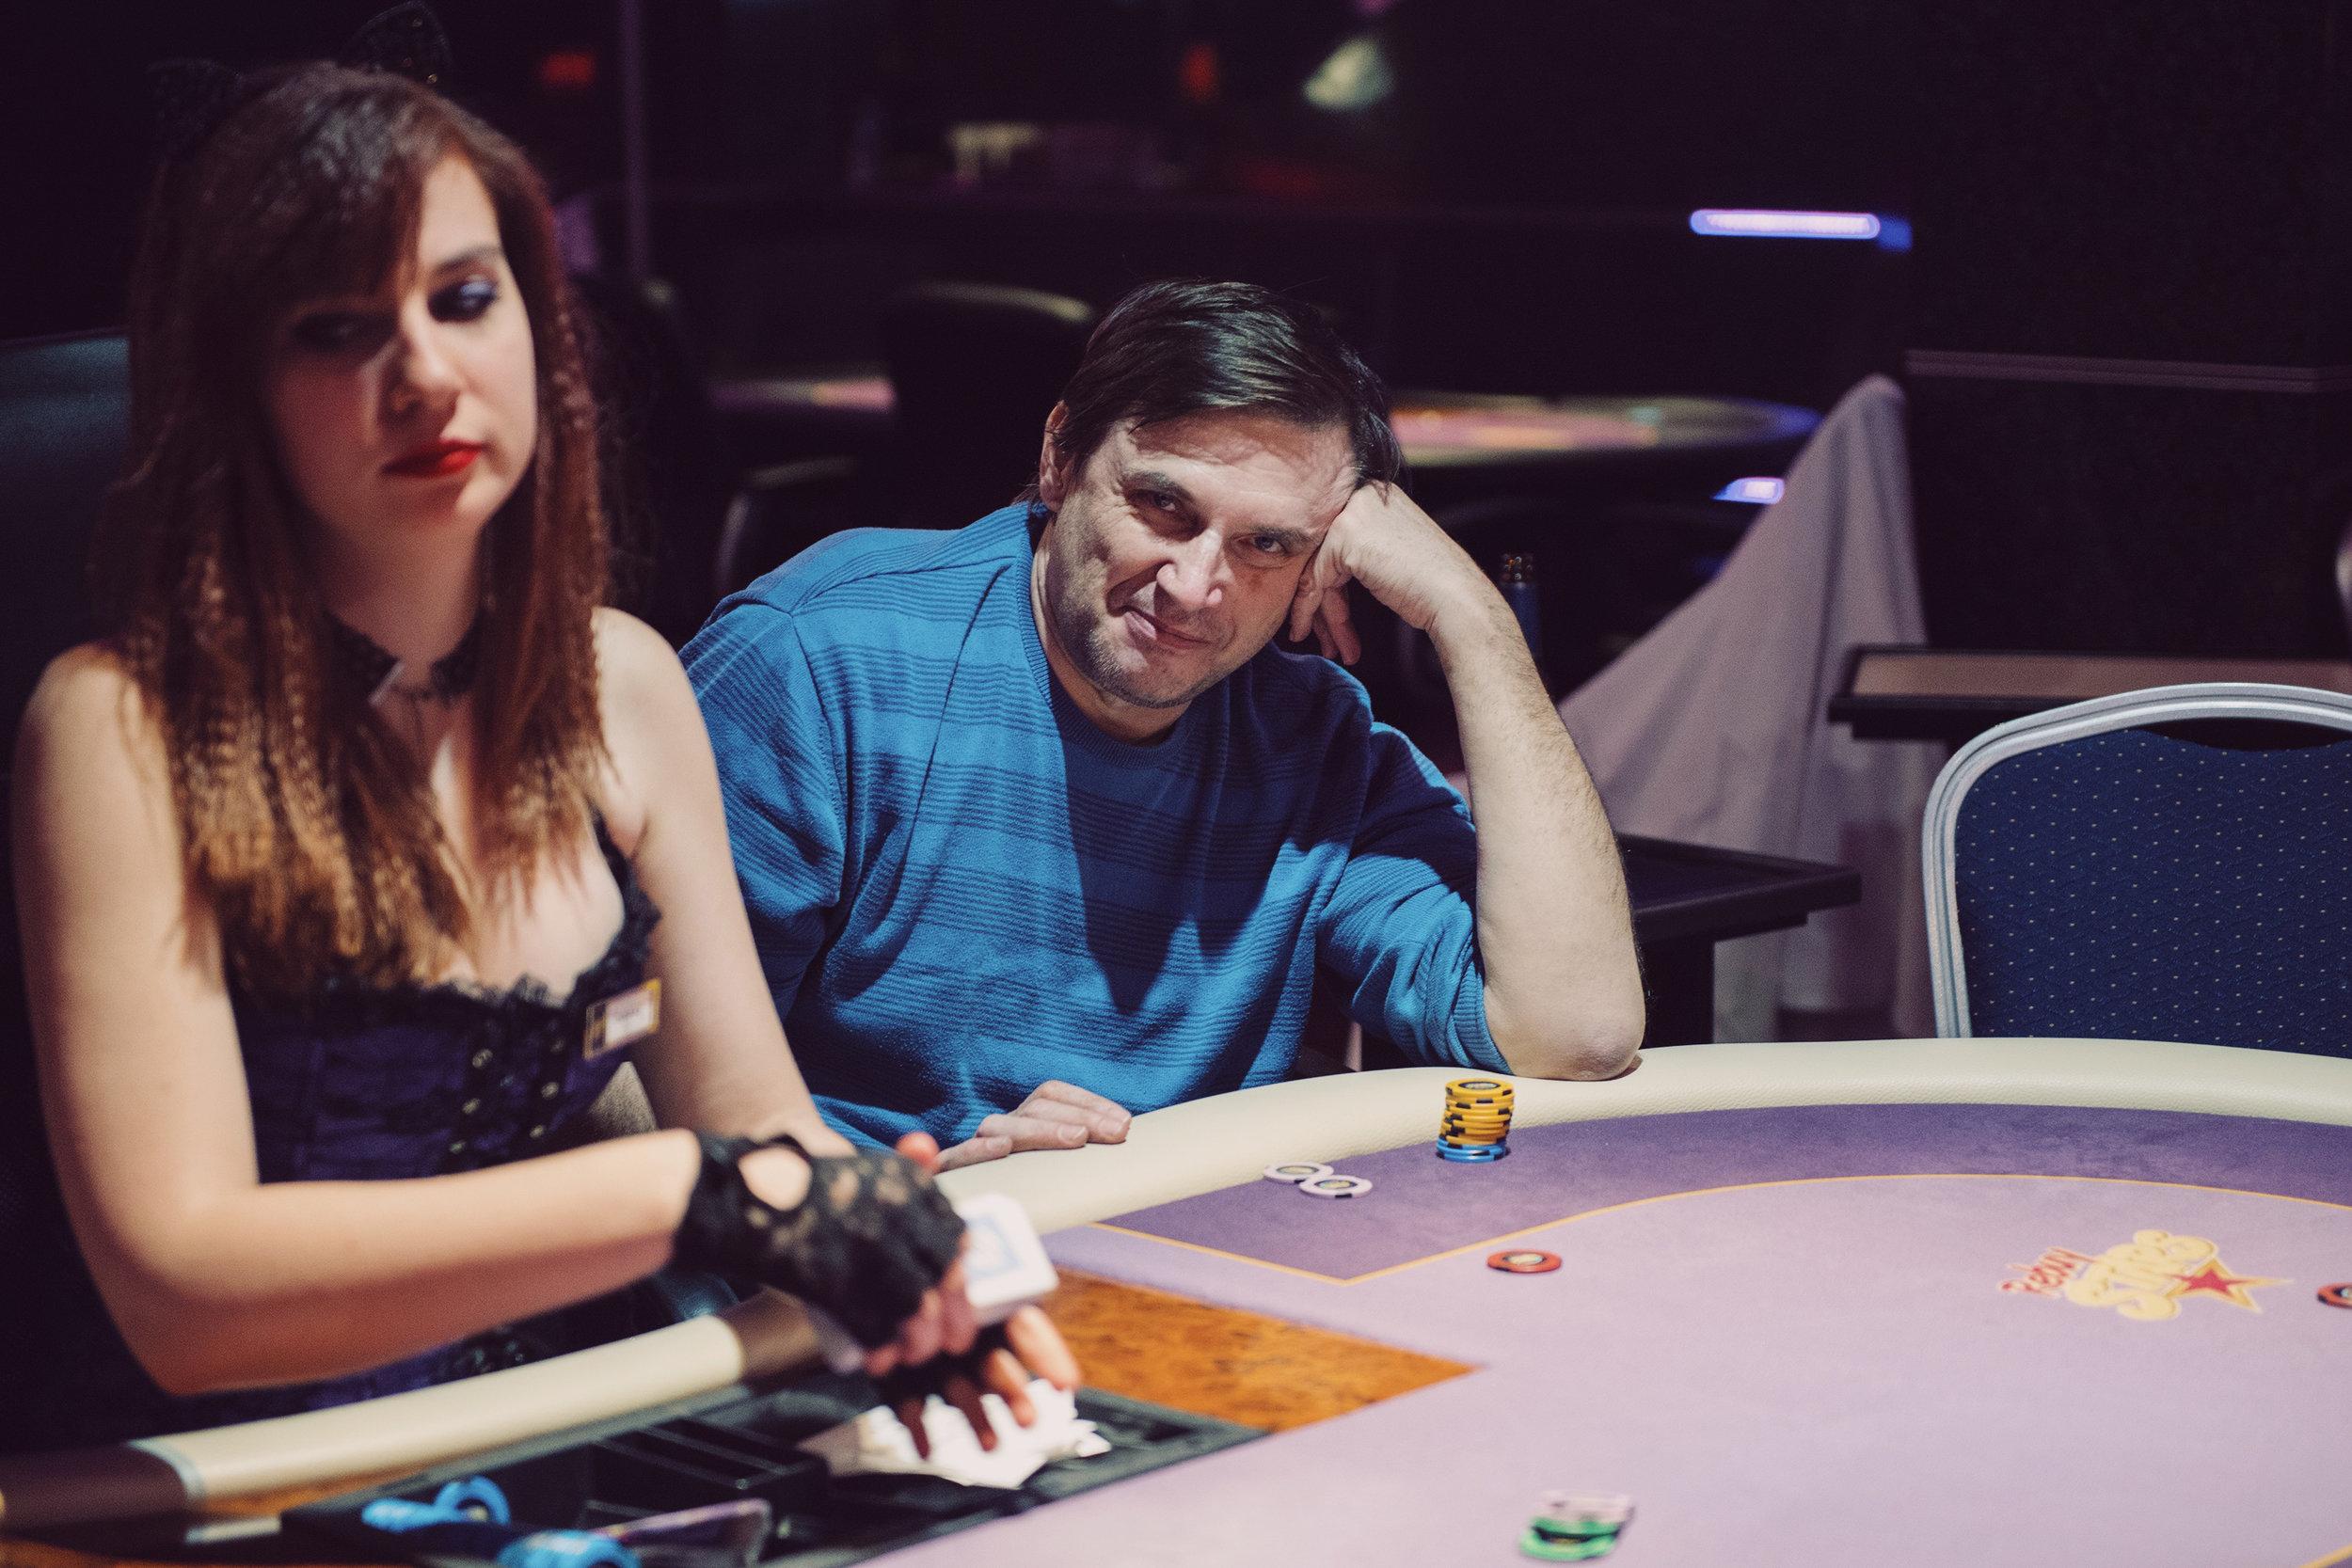 Poker-Photography-Europe-Polina-Shubkina-Casino-RebuyStars-018.JPG